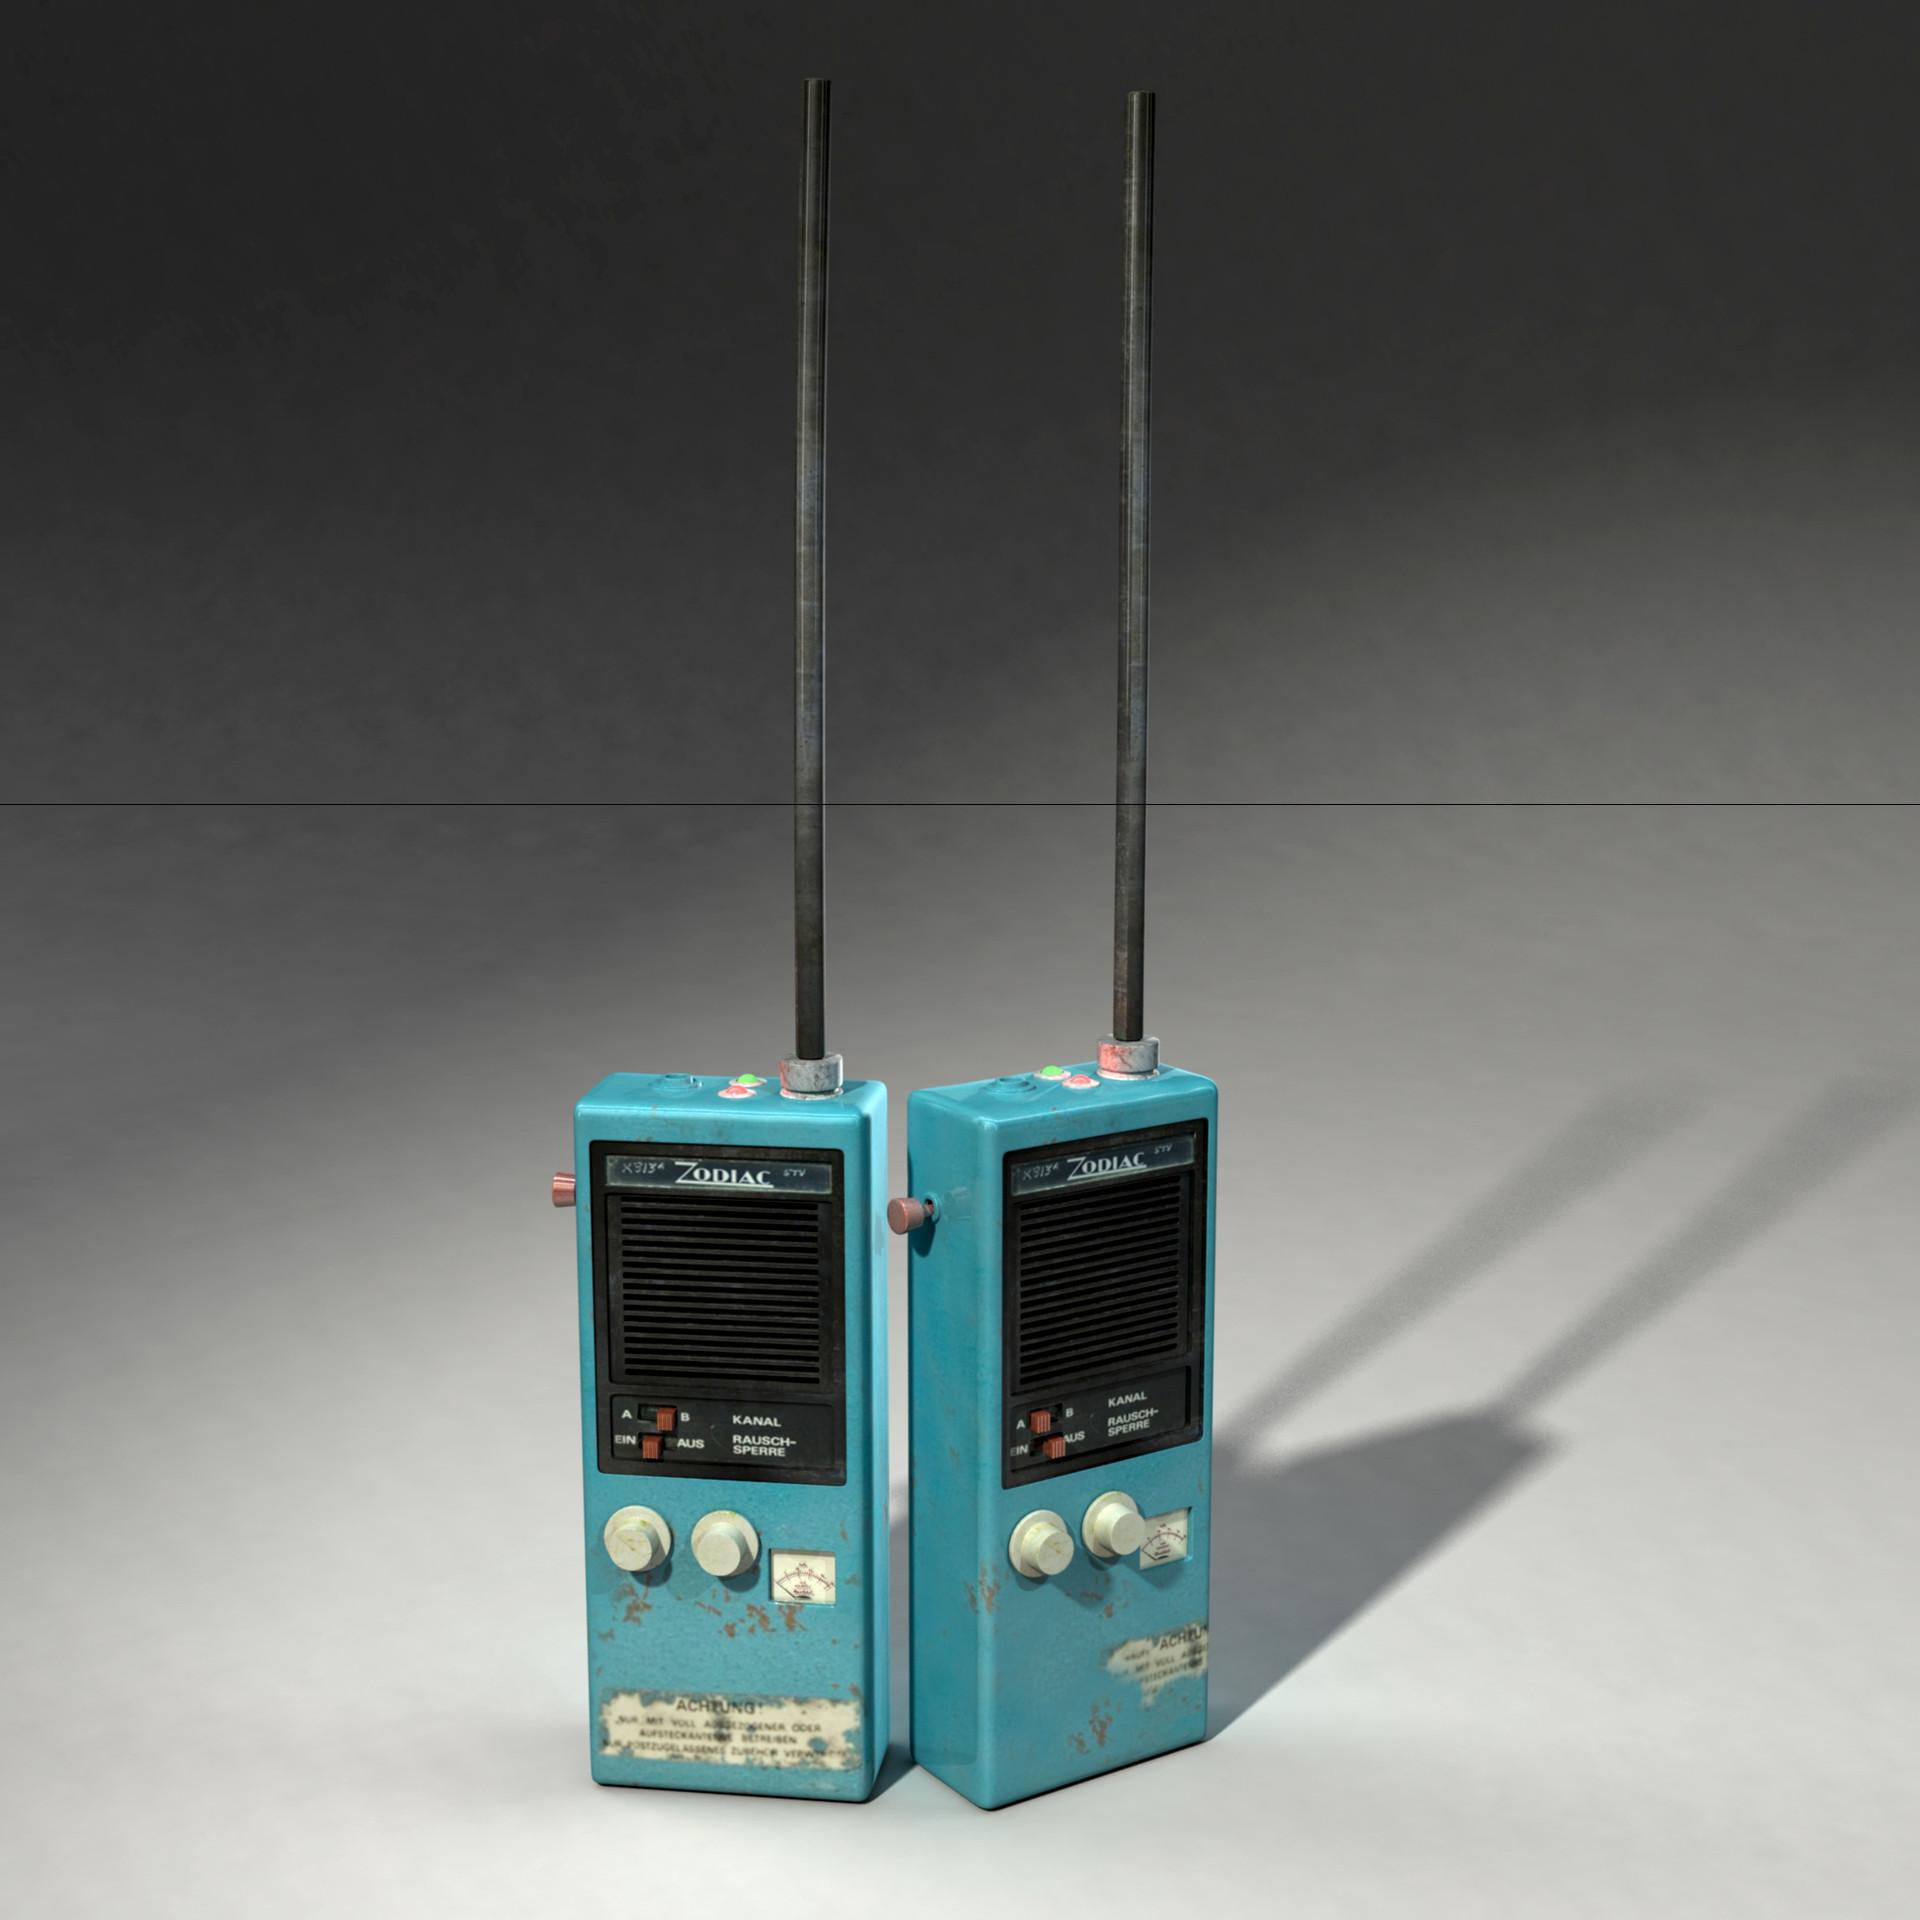 Nathan clark walkie talkies02